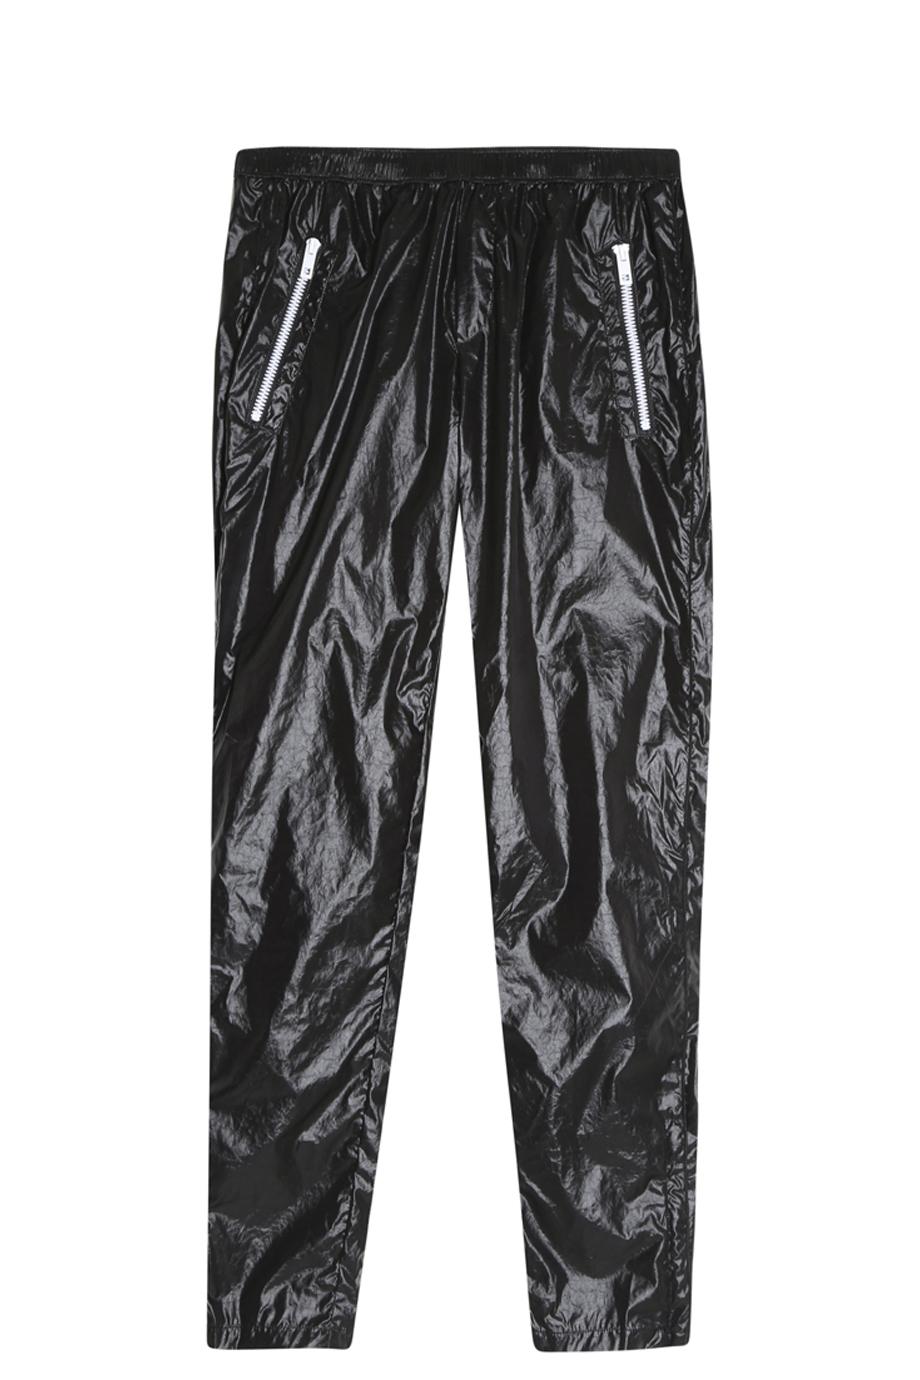 Rag Amp Bone Eugenia Trousers In Black Lyst